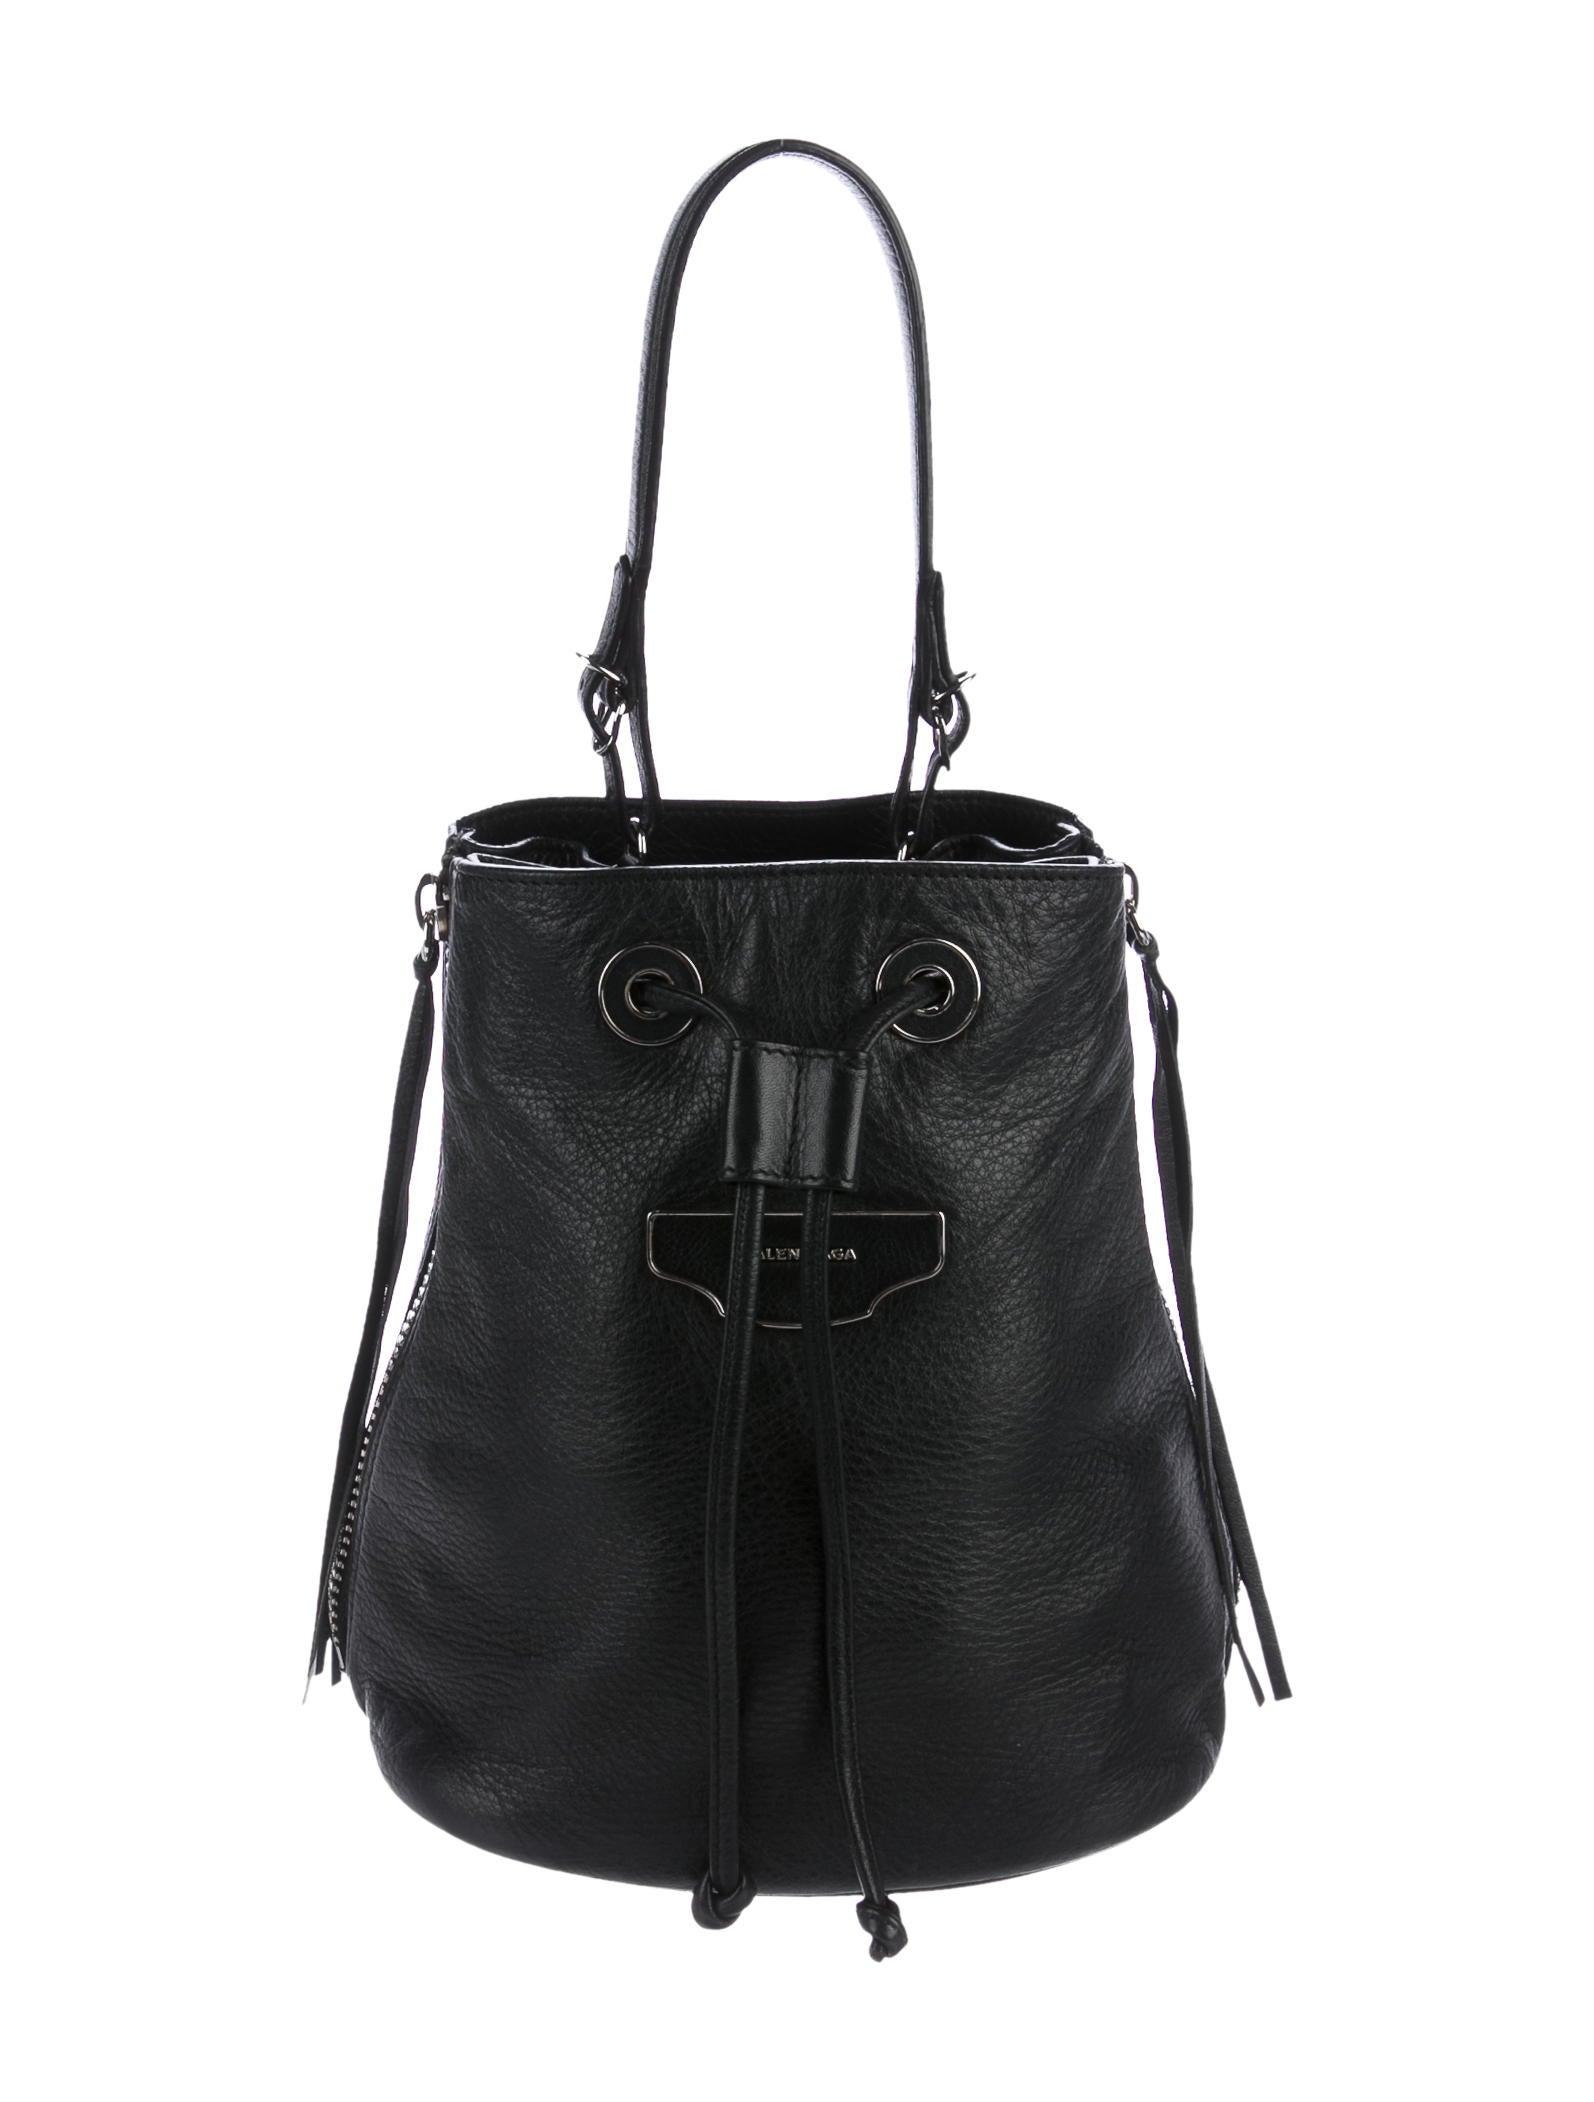 Balenciaga Papier Plate Bucket Bag - Handbags - BAL53600  b5898ca191aeb